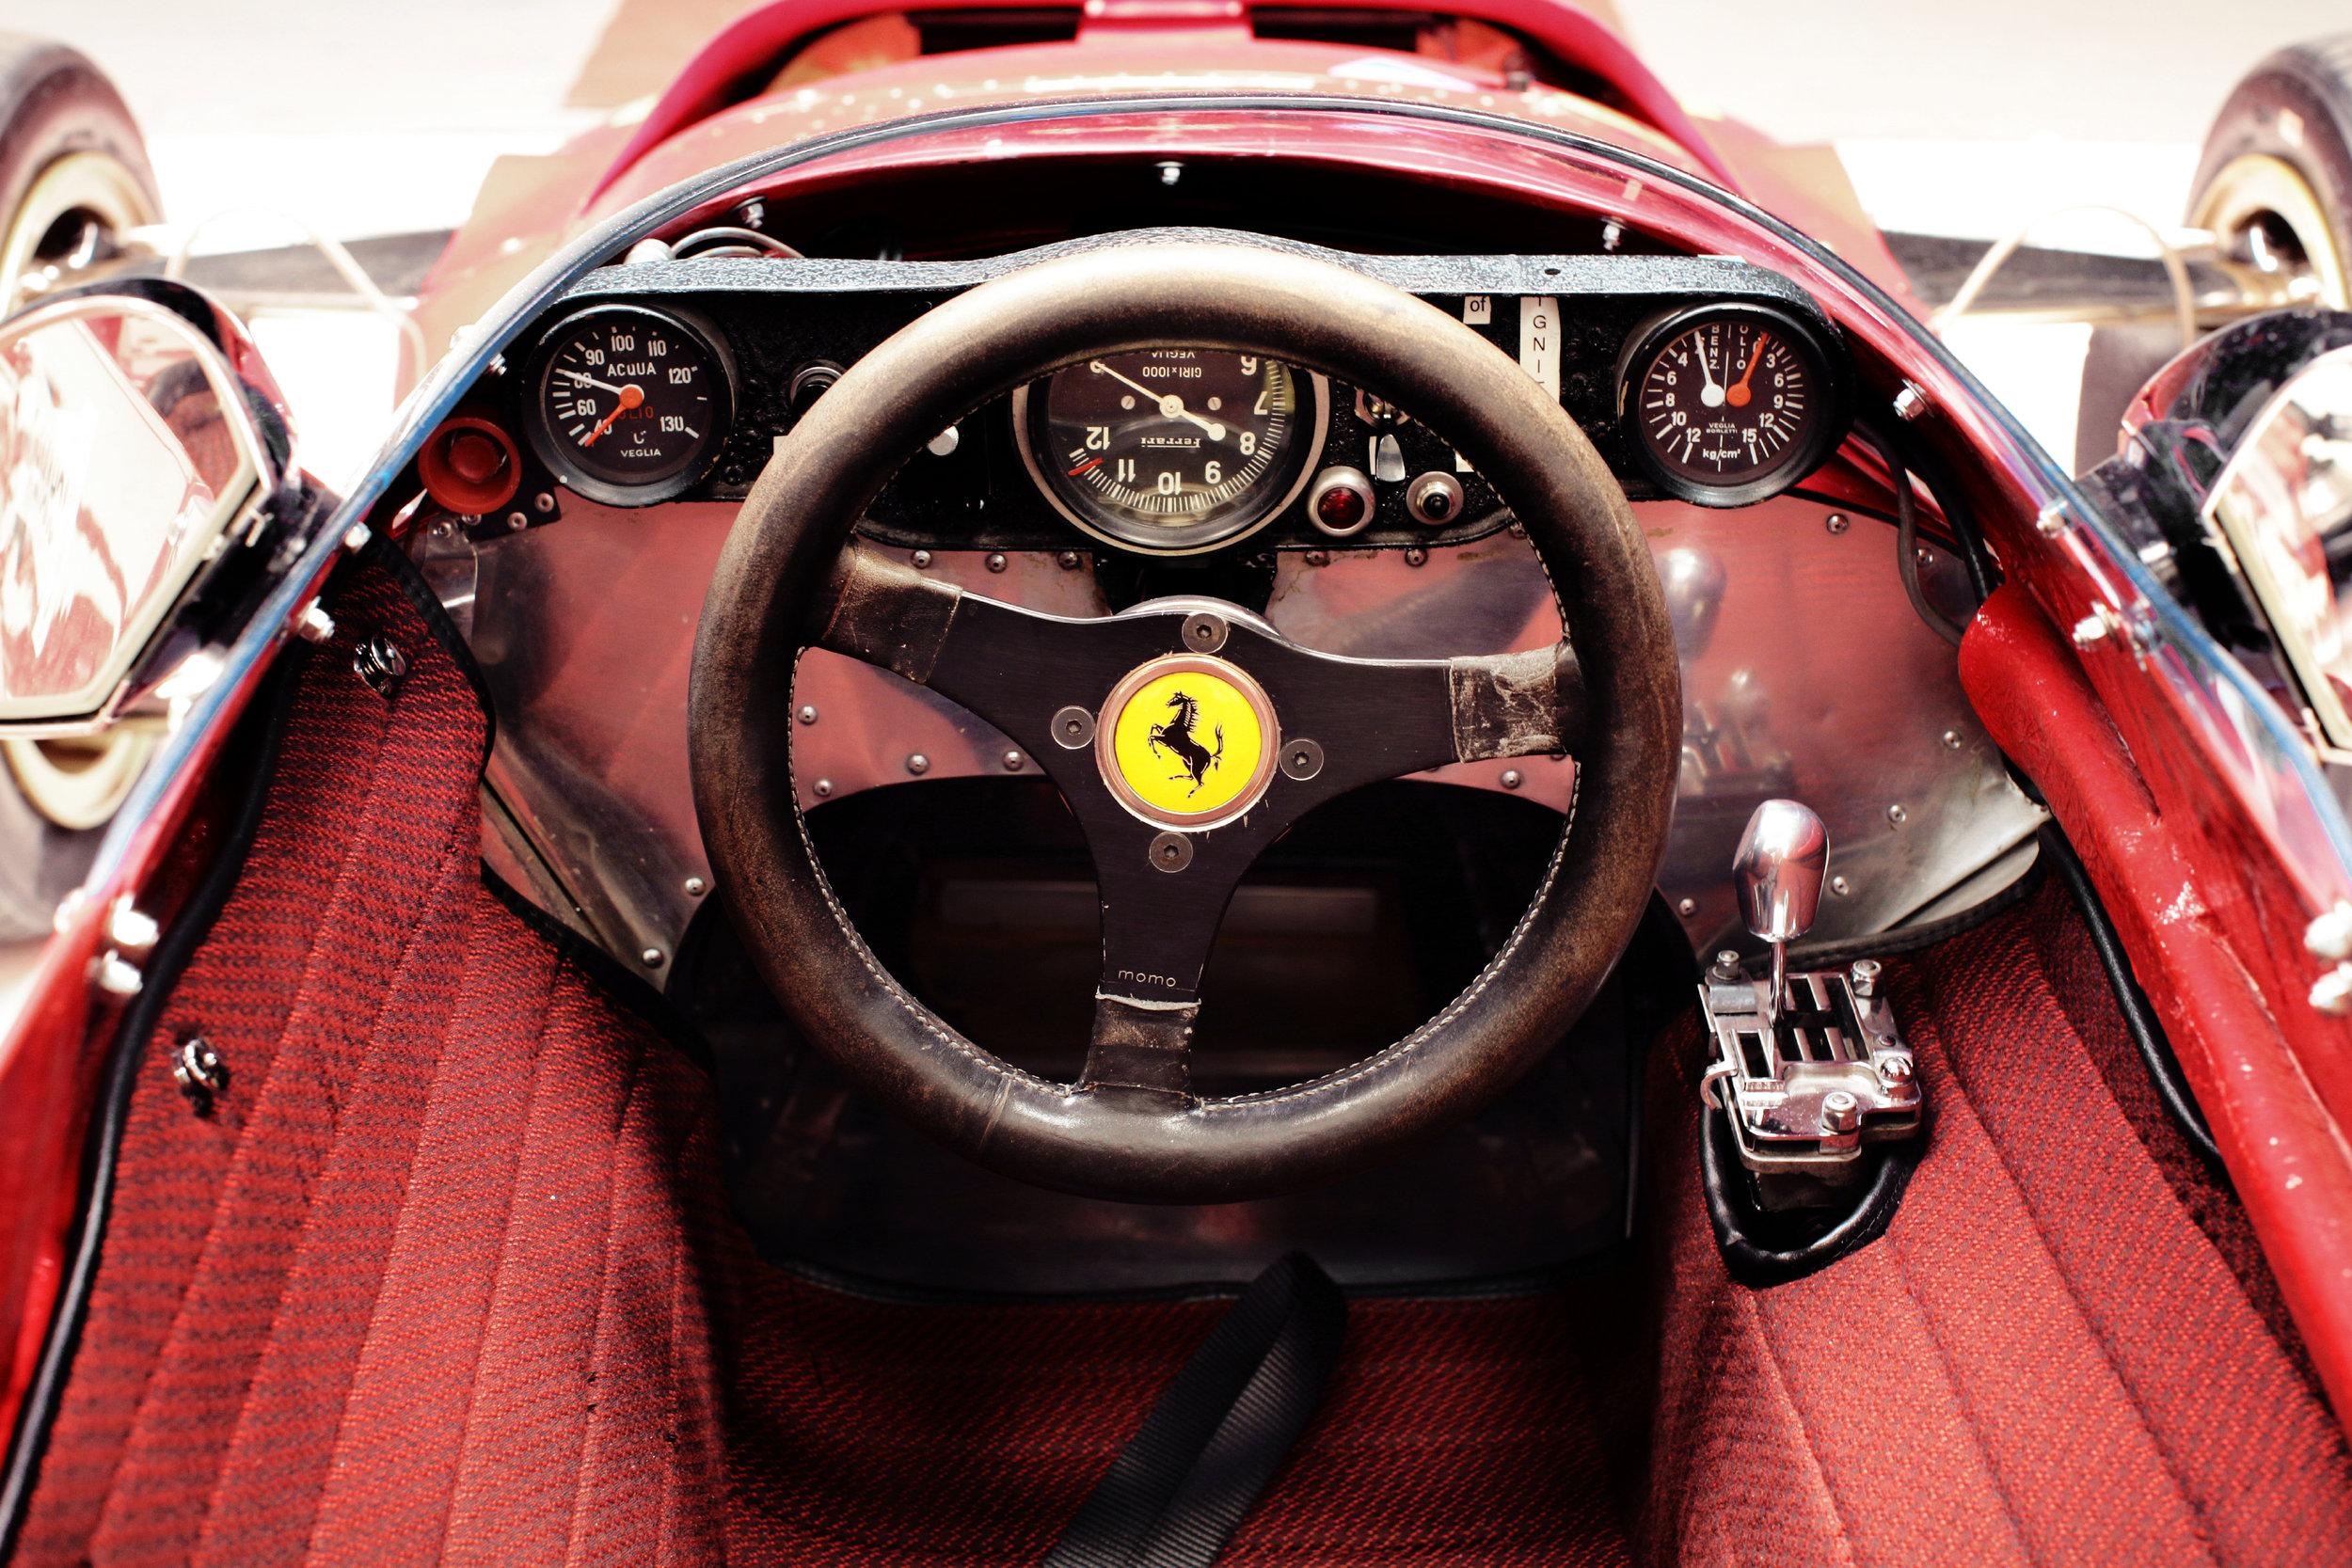 06_StillLife_©GherardoBenfenati_Ferrari312B_cockpit.jpg